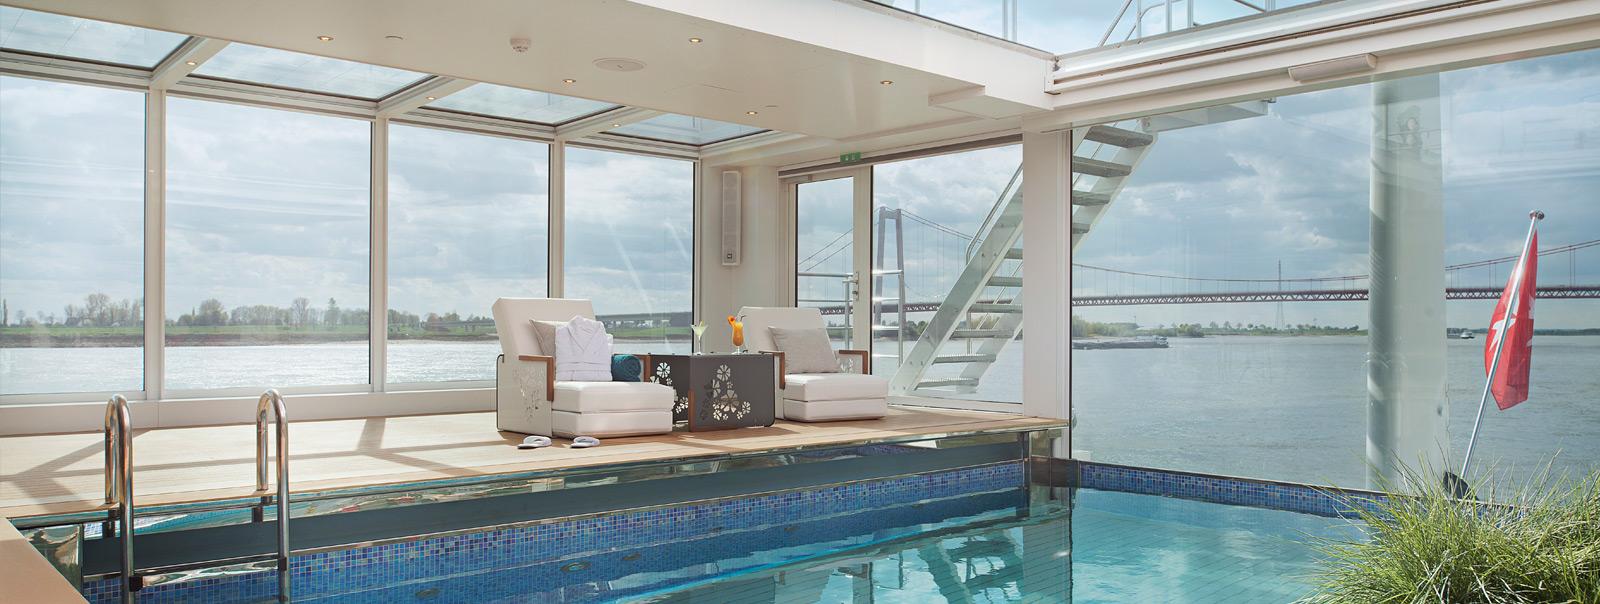 exclusive-swimmingpool